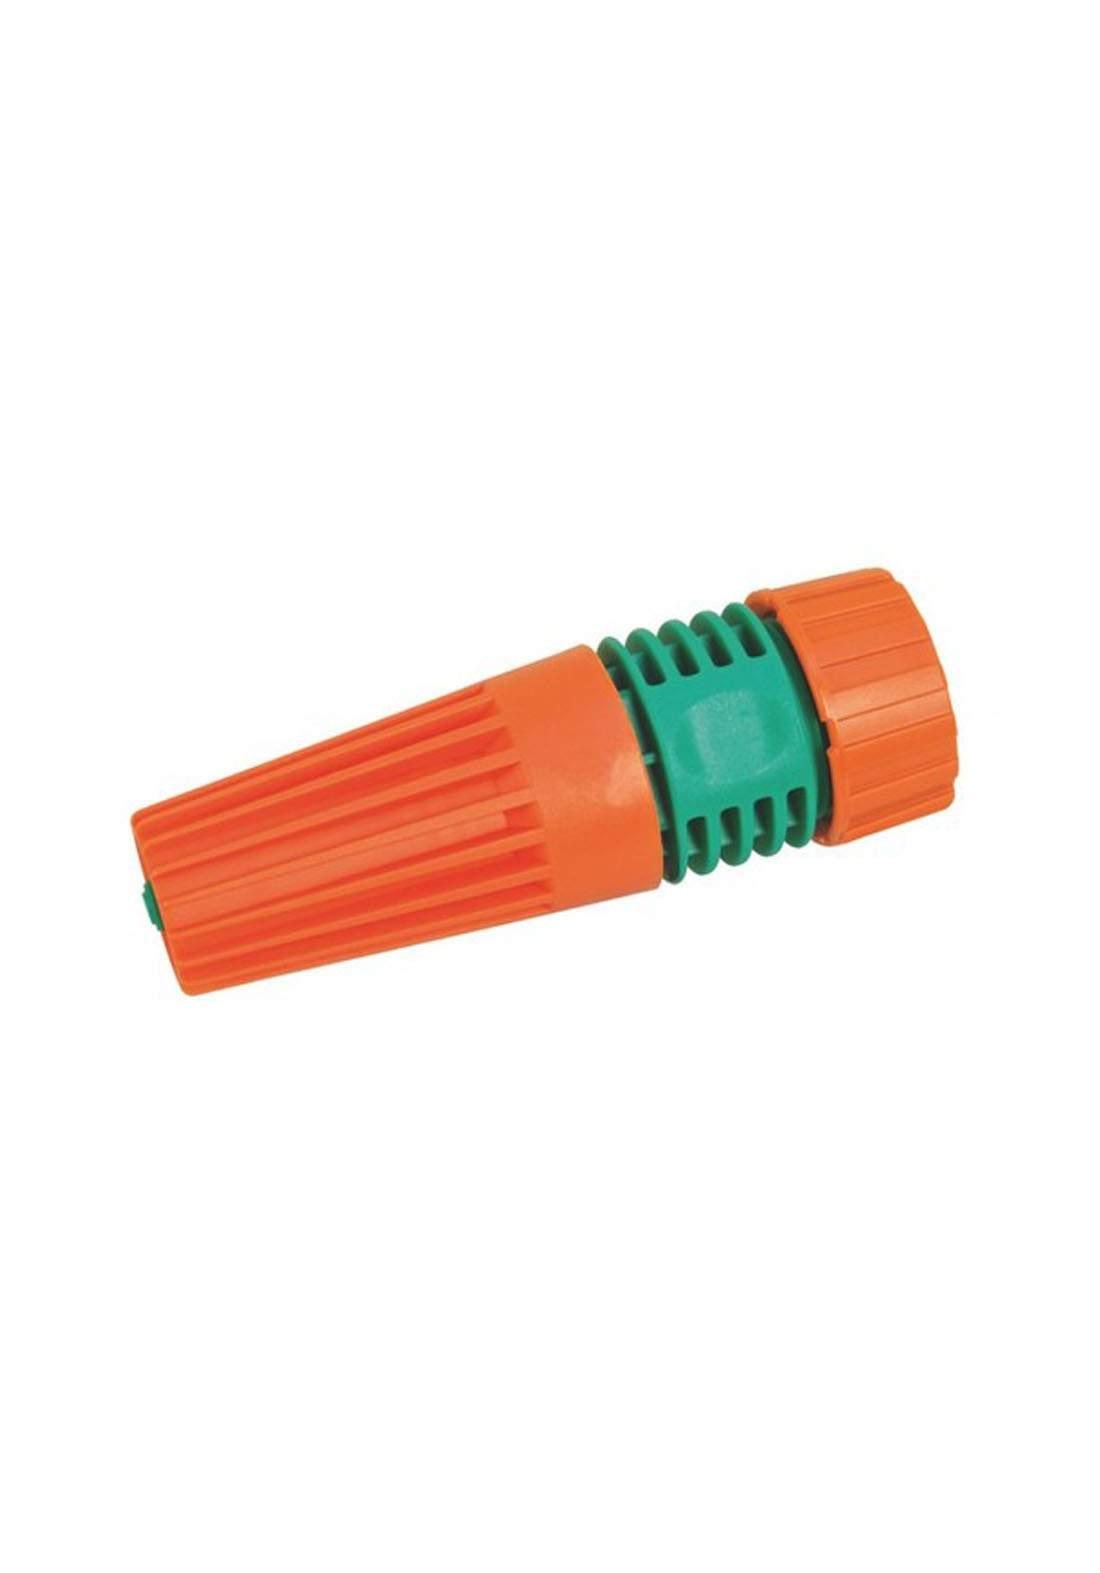 Tramontina '78514/500 Threaded coupling nozzle 10 cm in length رشاش ماء طول 10 سم